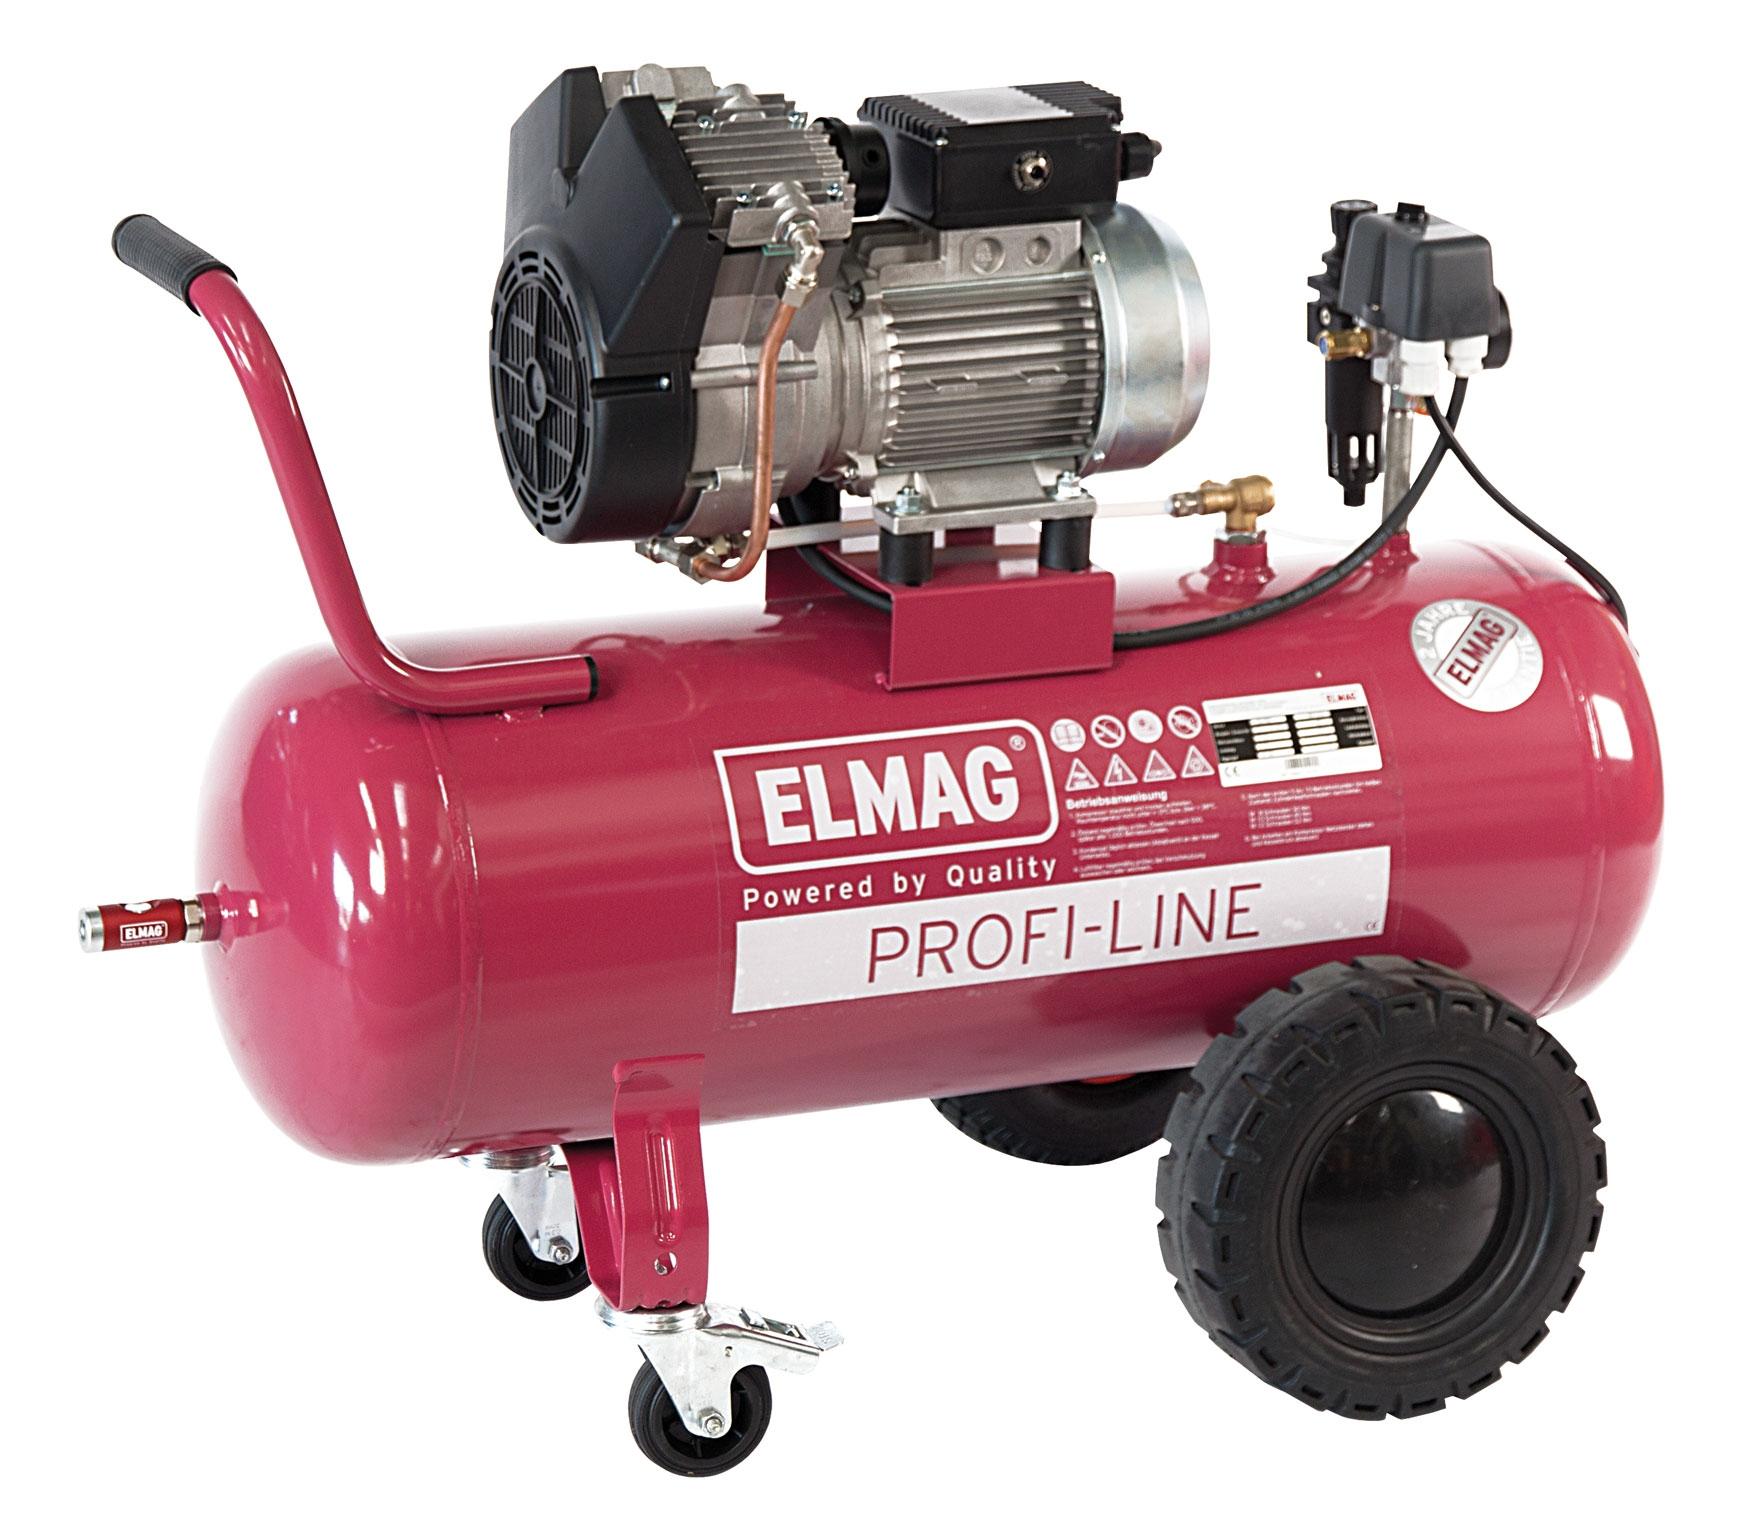 Elmag ölfreier Kompressor PROFI-LINE PL 460/10/50 W